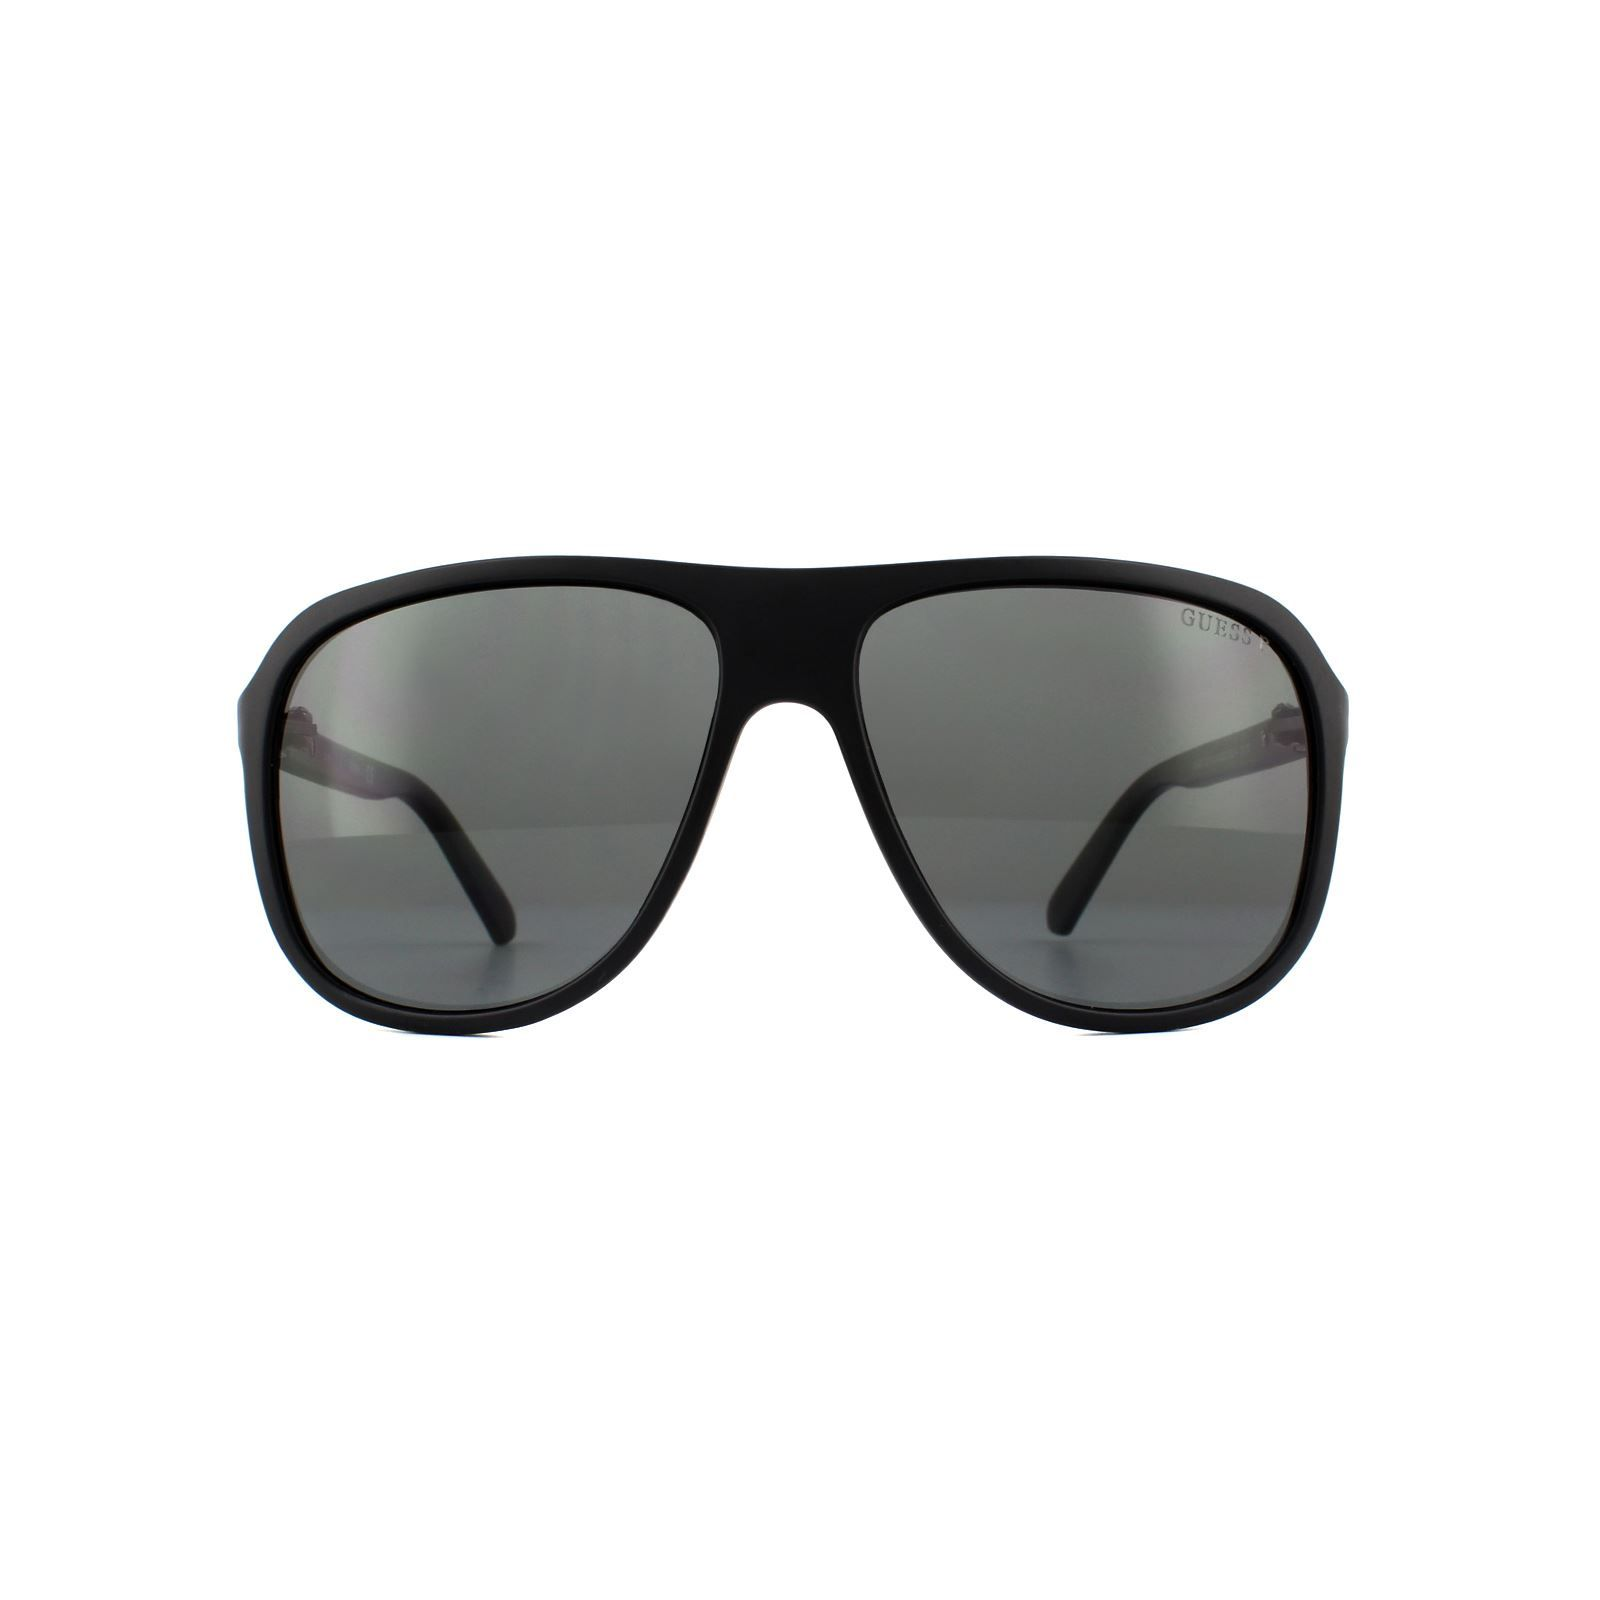 Guess Sunglasses GU6876 02D Black Grey